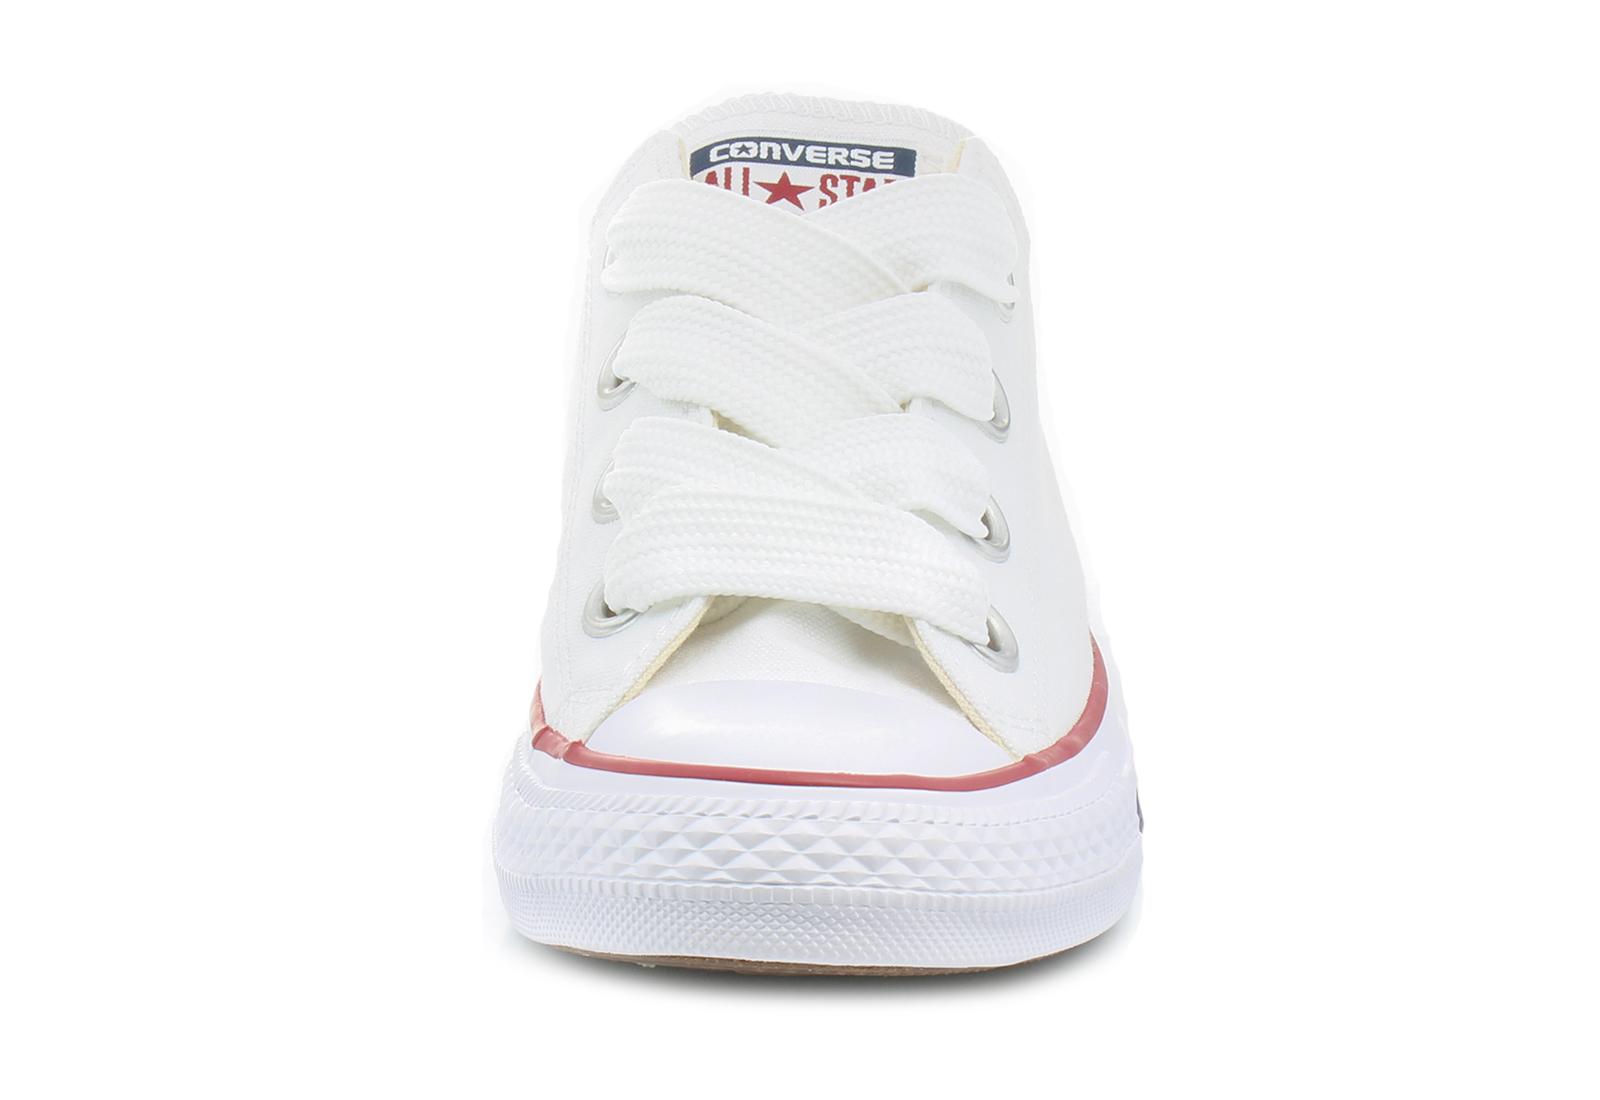 Converse Sneakers - Chuck Taylor All Star Big Eyelets - 559935C ... 5db8d310490